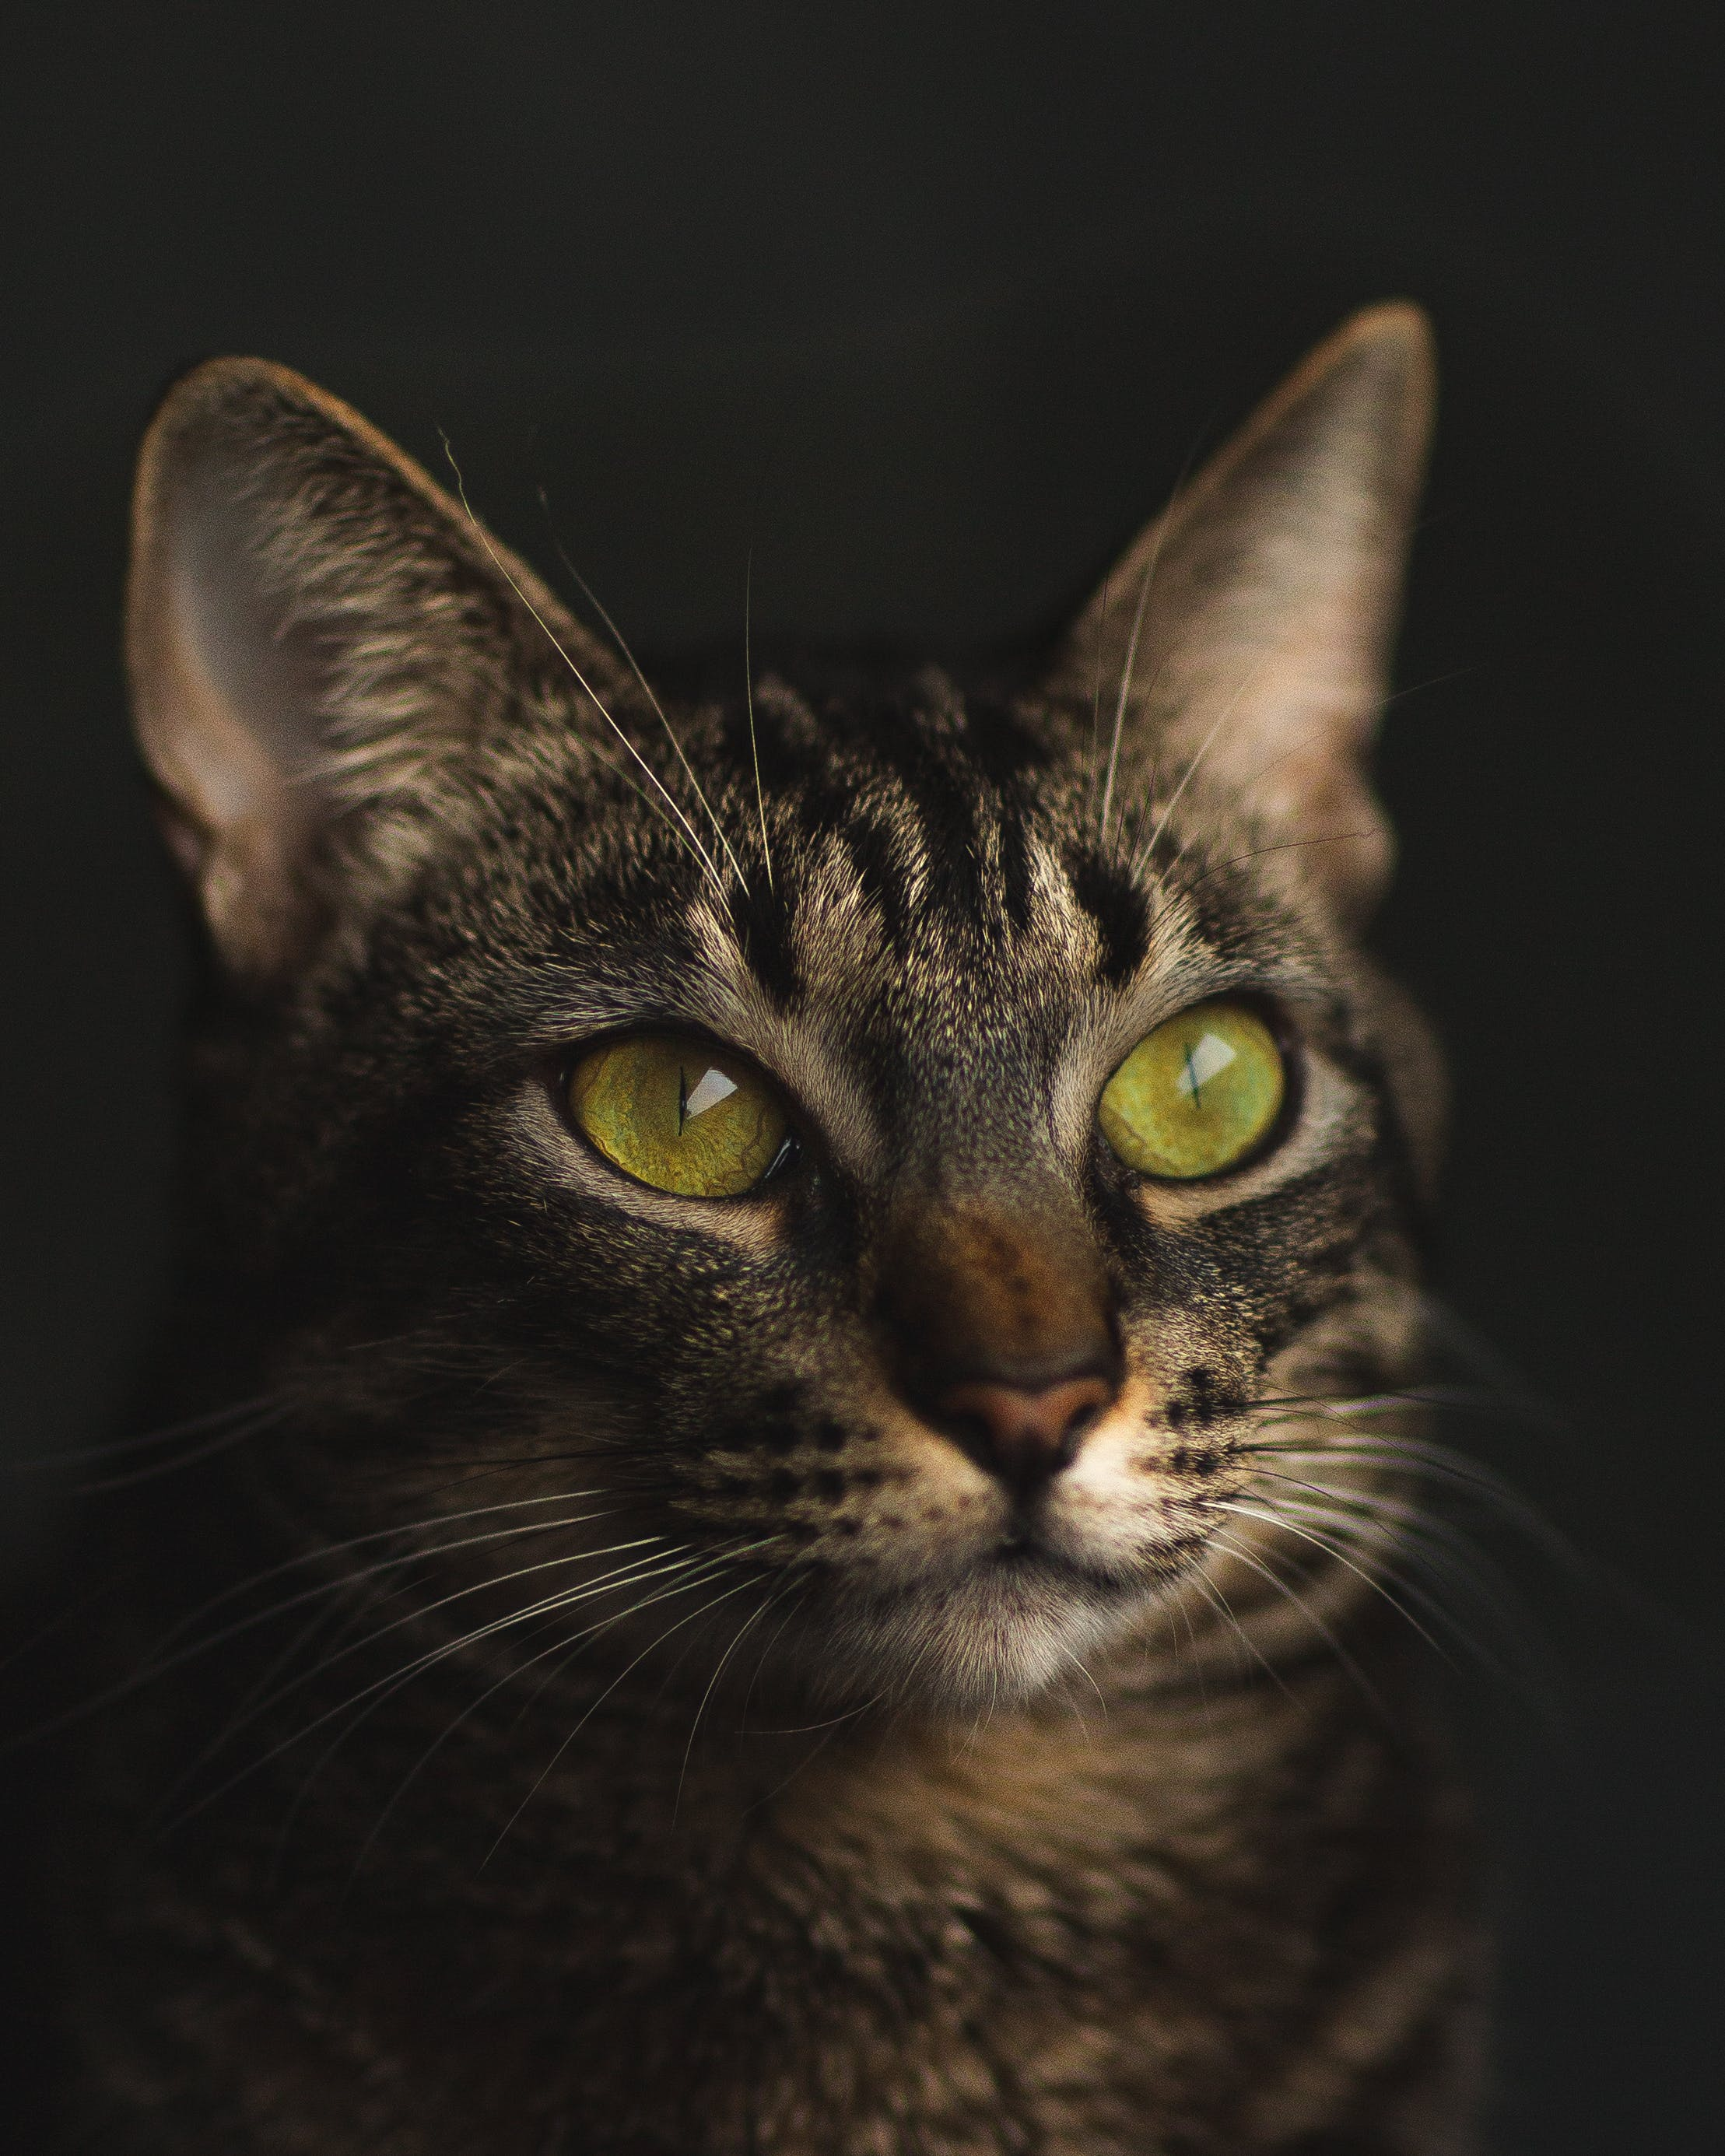 Short-fur Black and Gray Cat